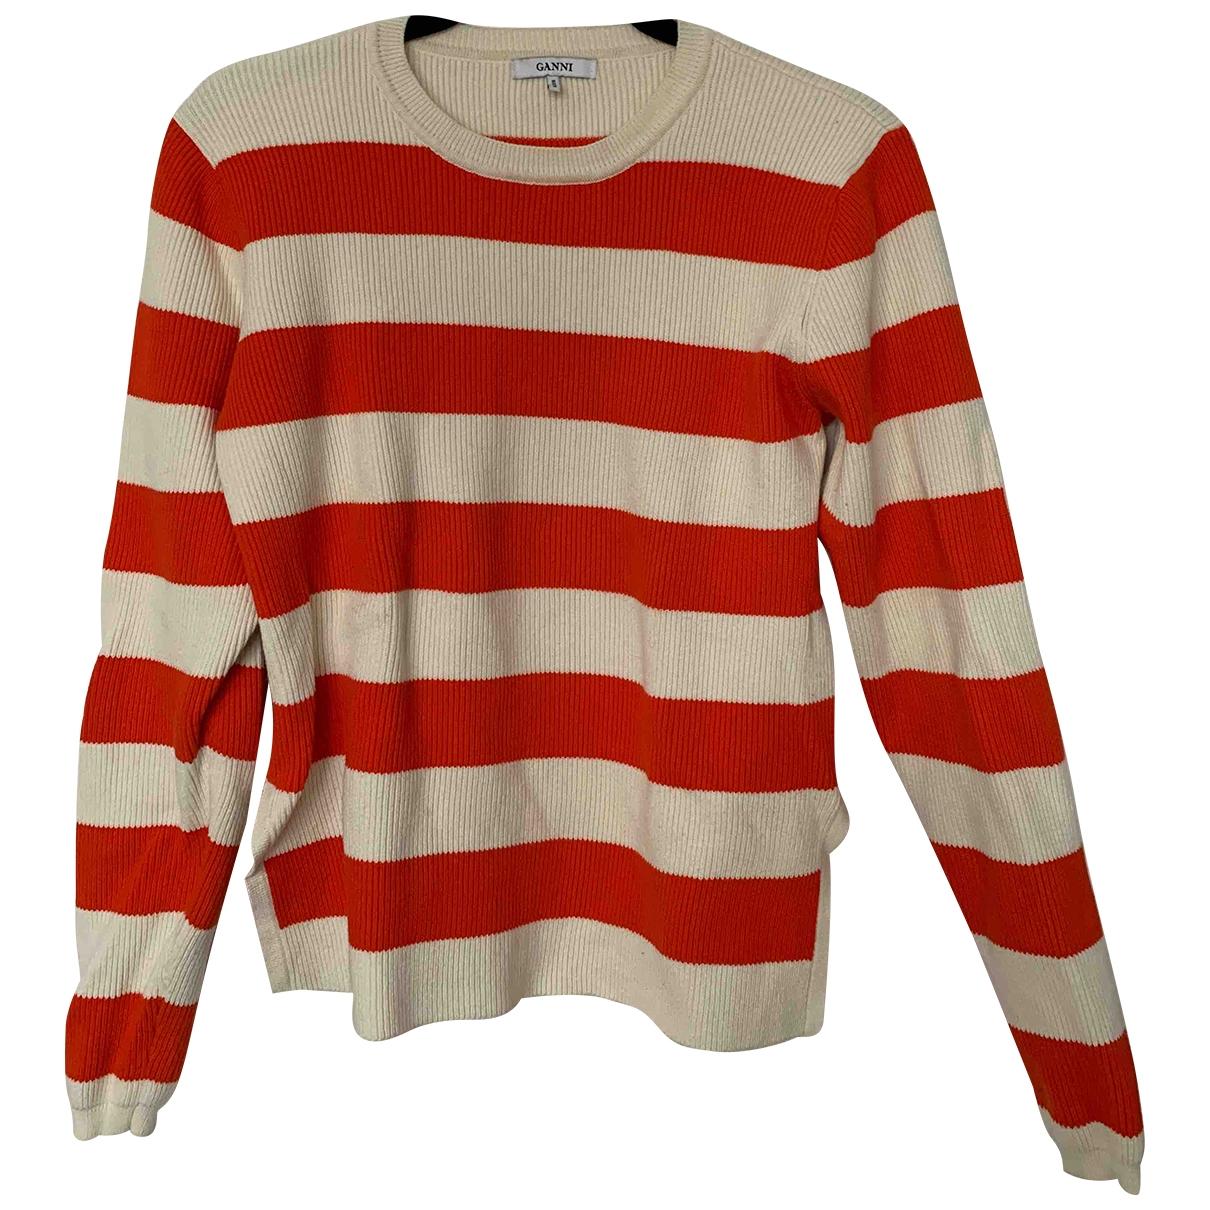 Ganni - Pull Spring Summer 2019 pour femme en coton - rouge